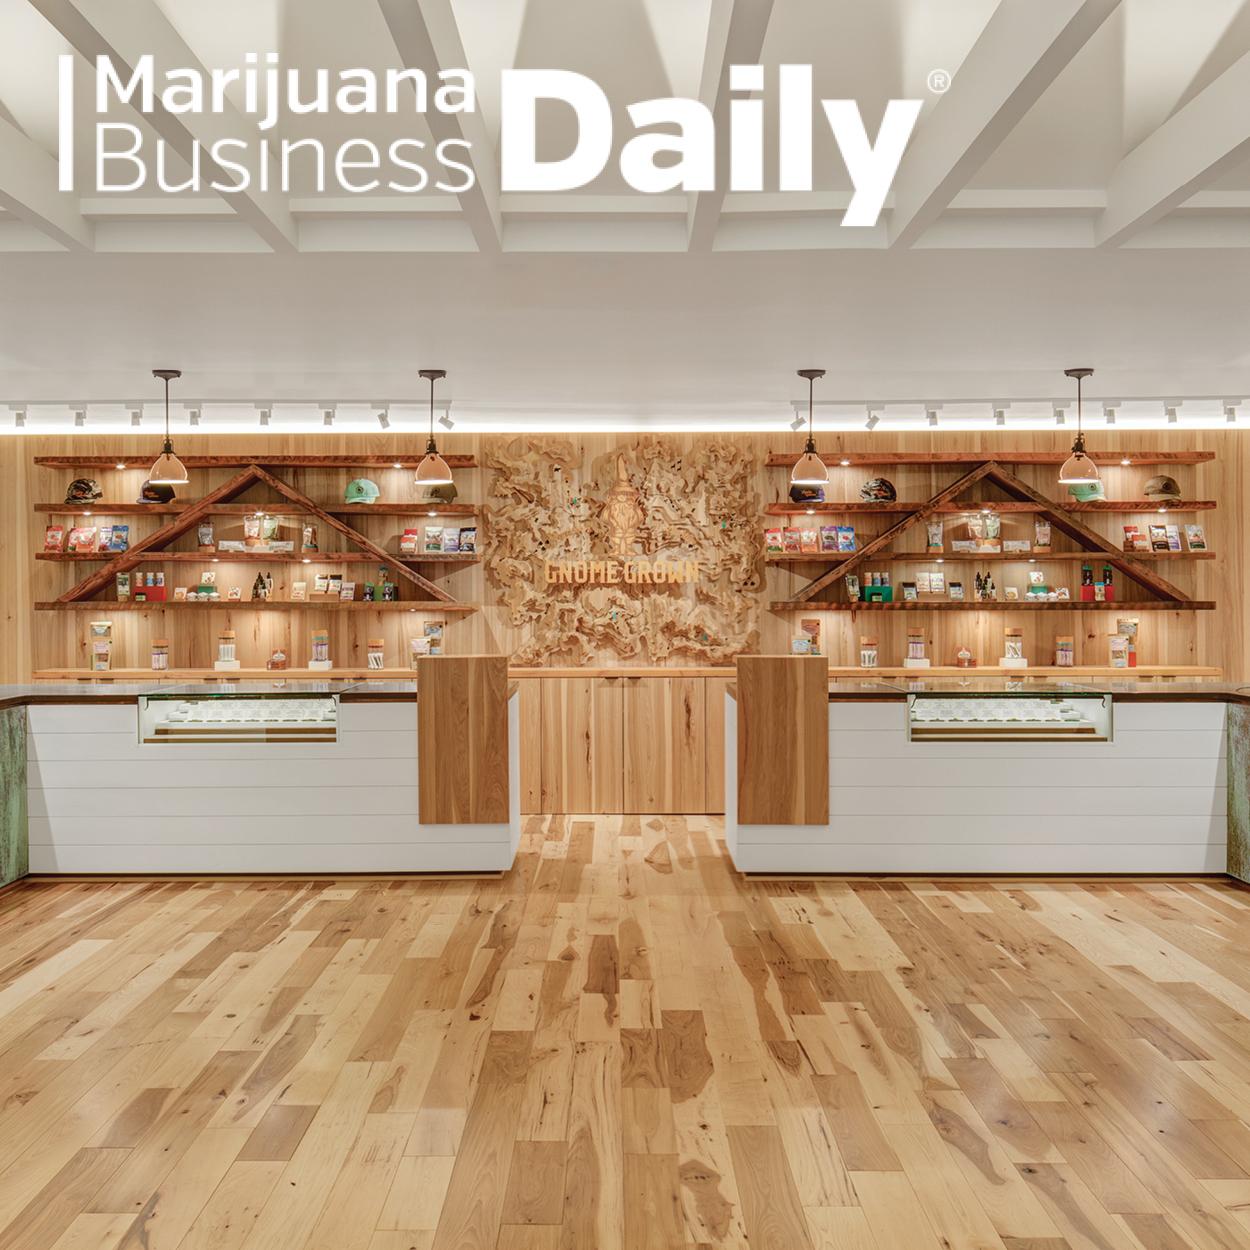 MJ Biz - Marijuana retailers consider volume, customer experience when designing sales floor